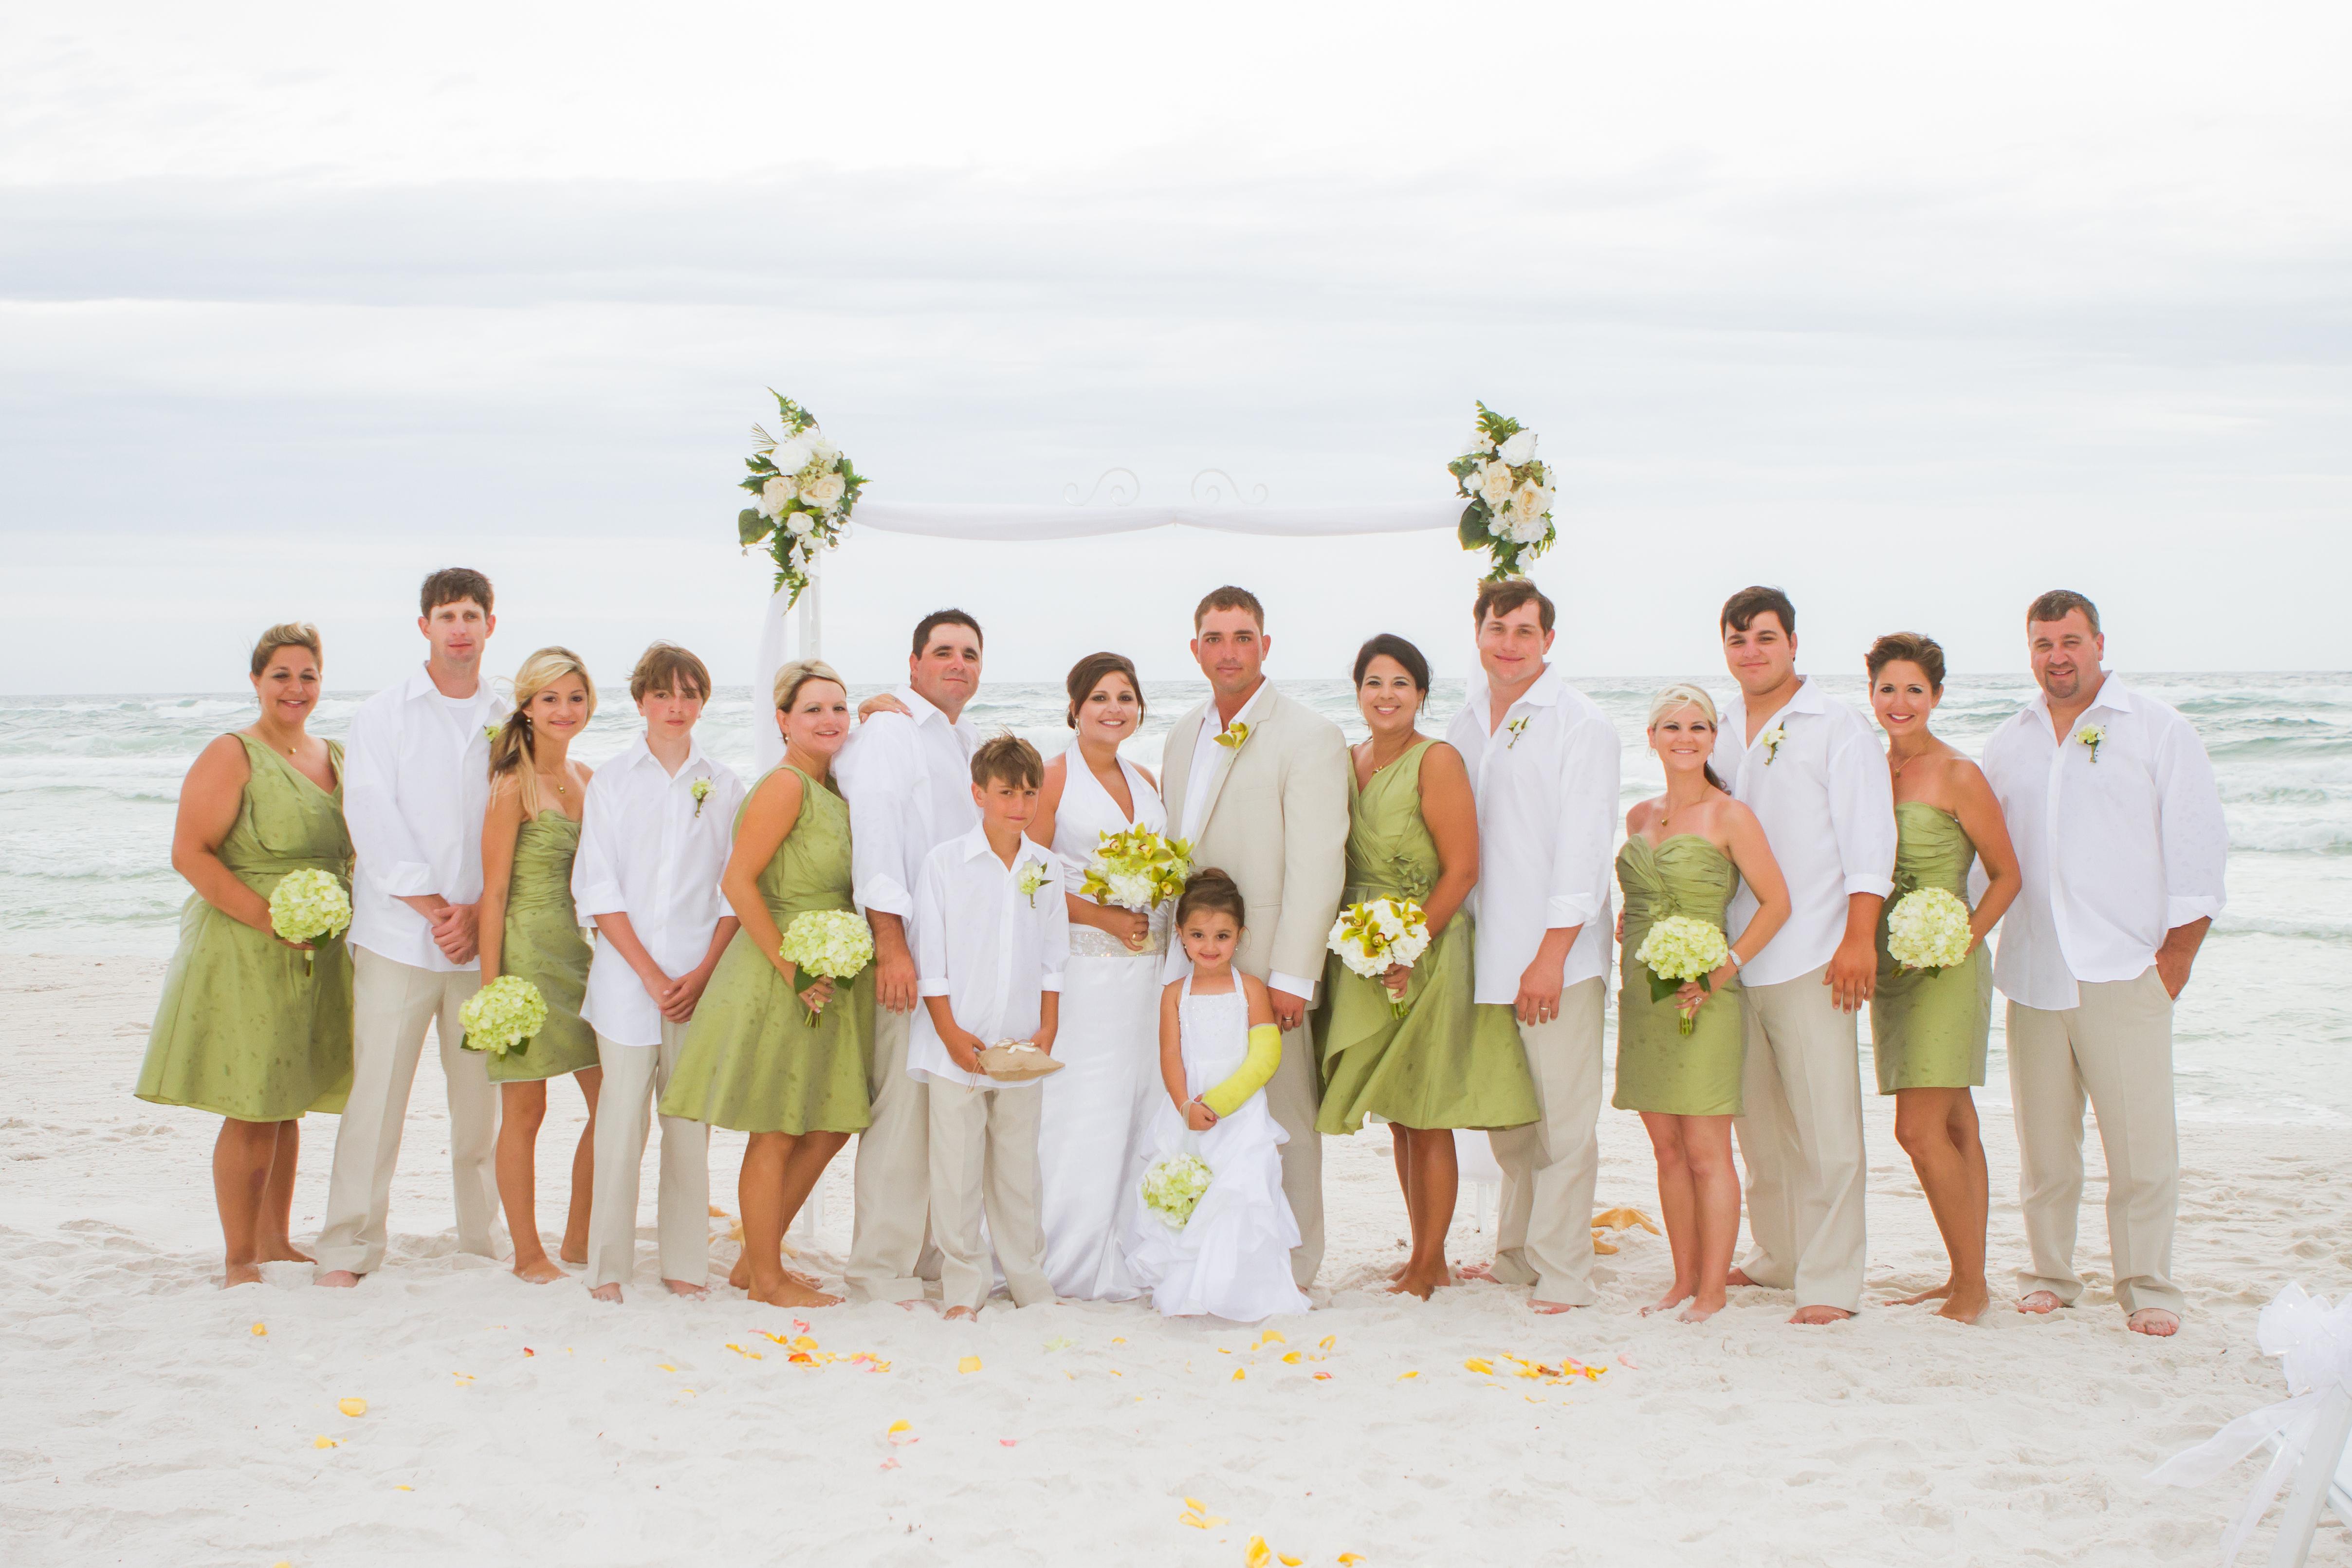 PANAMA CITY WEDDINGS BEACH FLORIDA